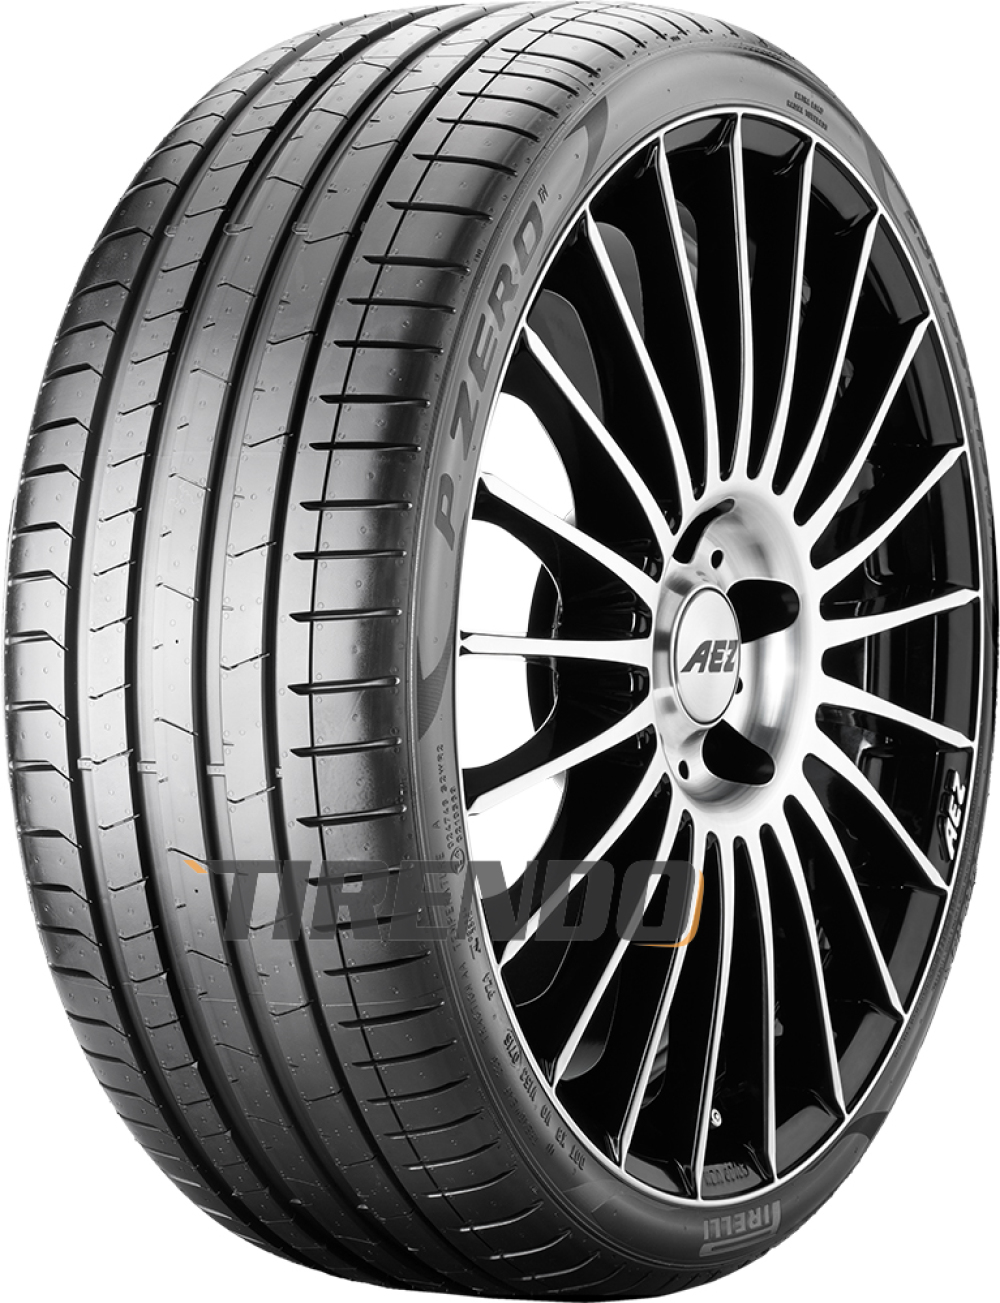 Pirelli P Zero LS ( 315/30 ZR22 (107Y) XL B )